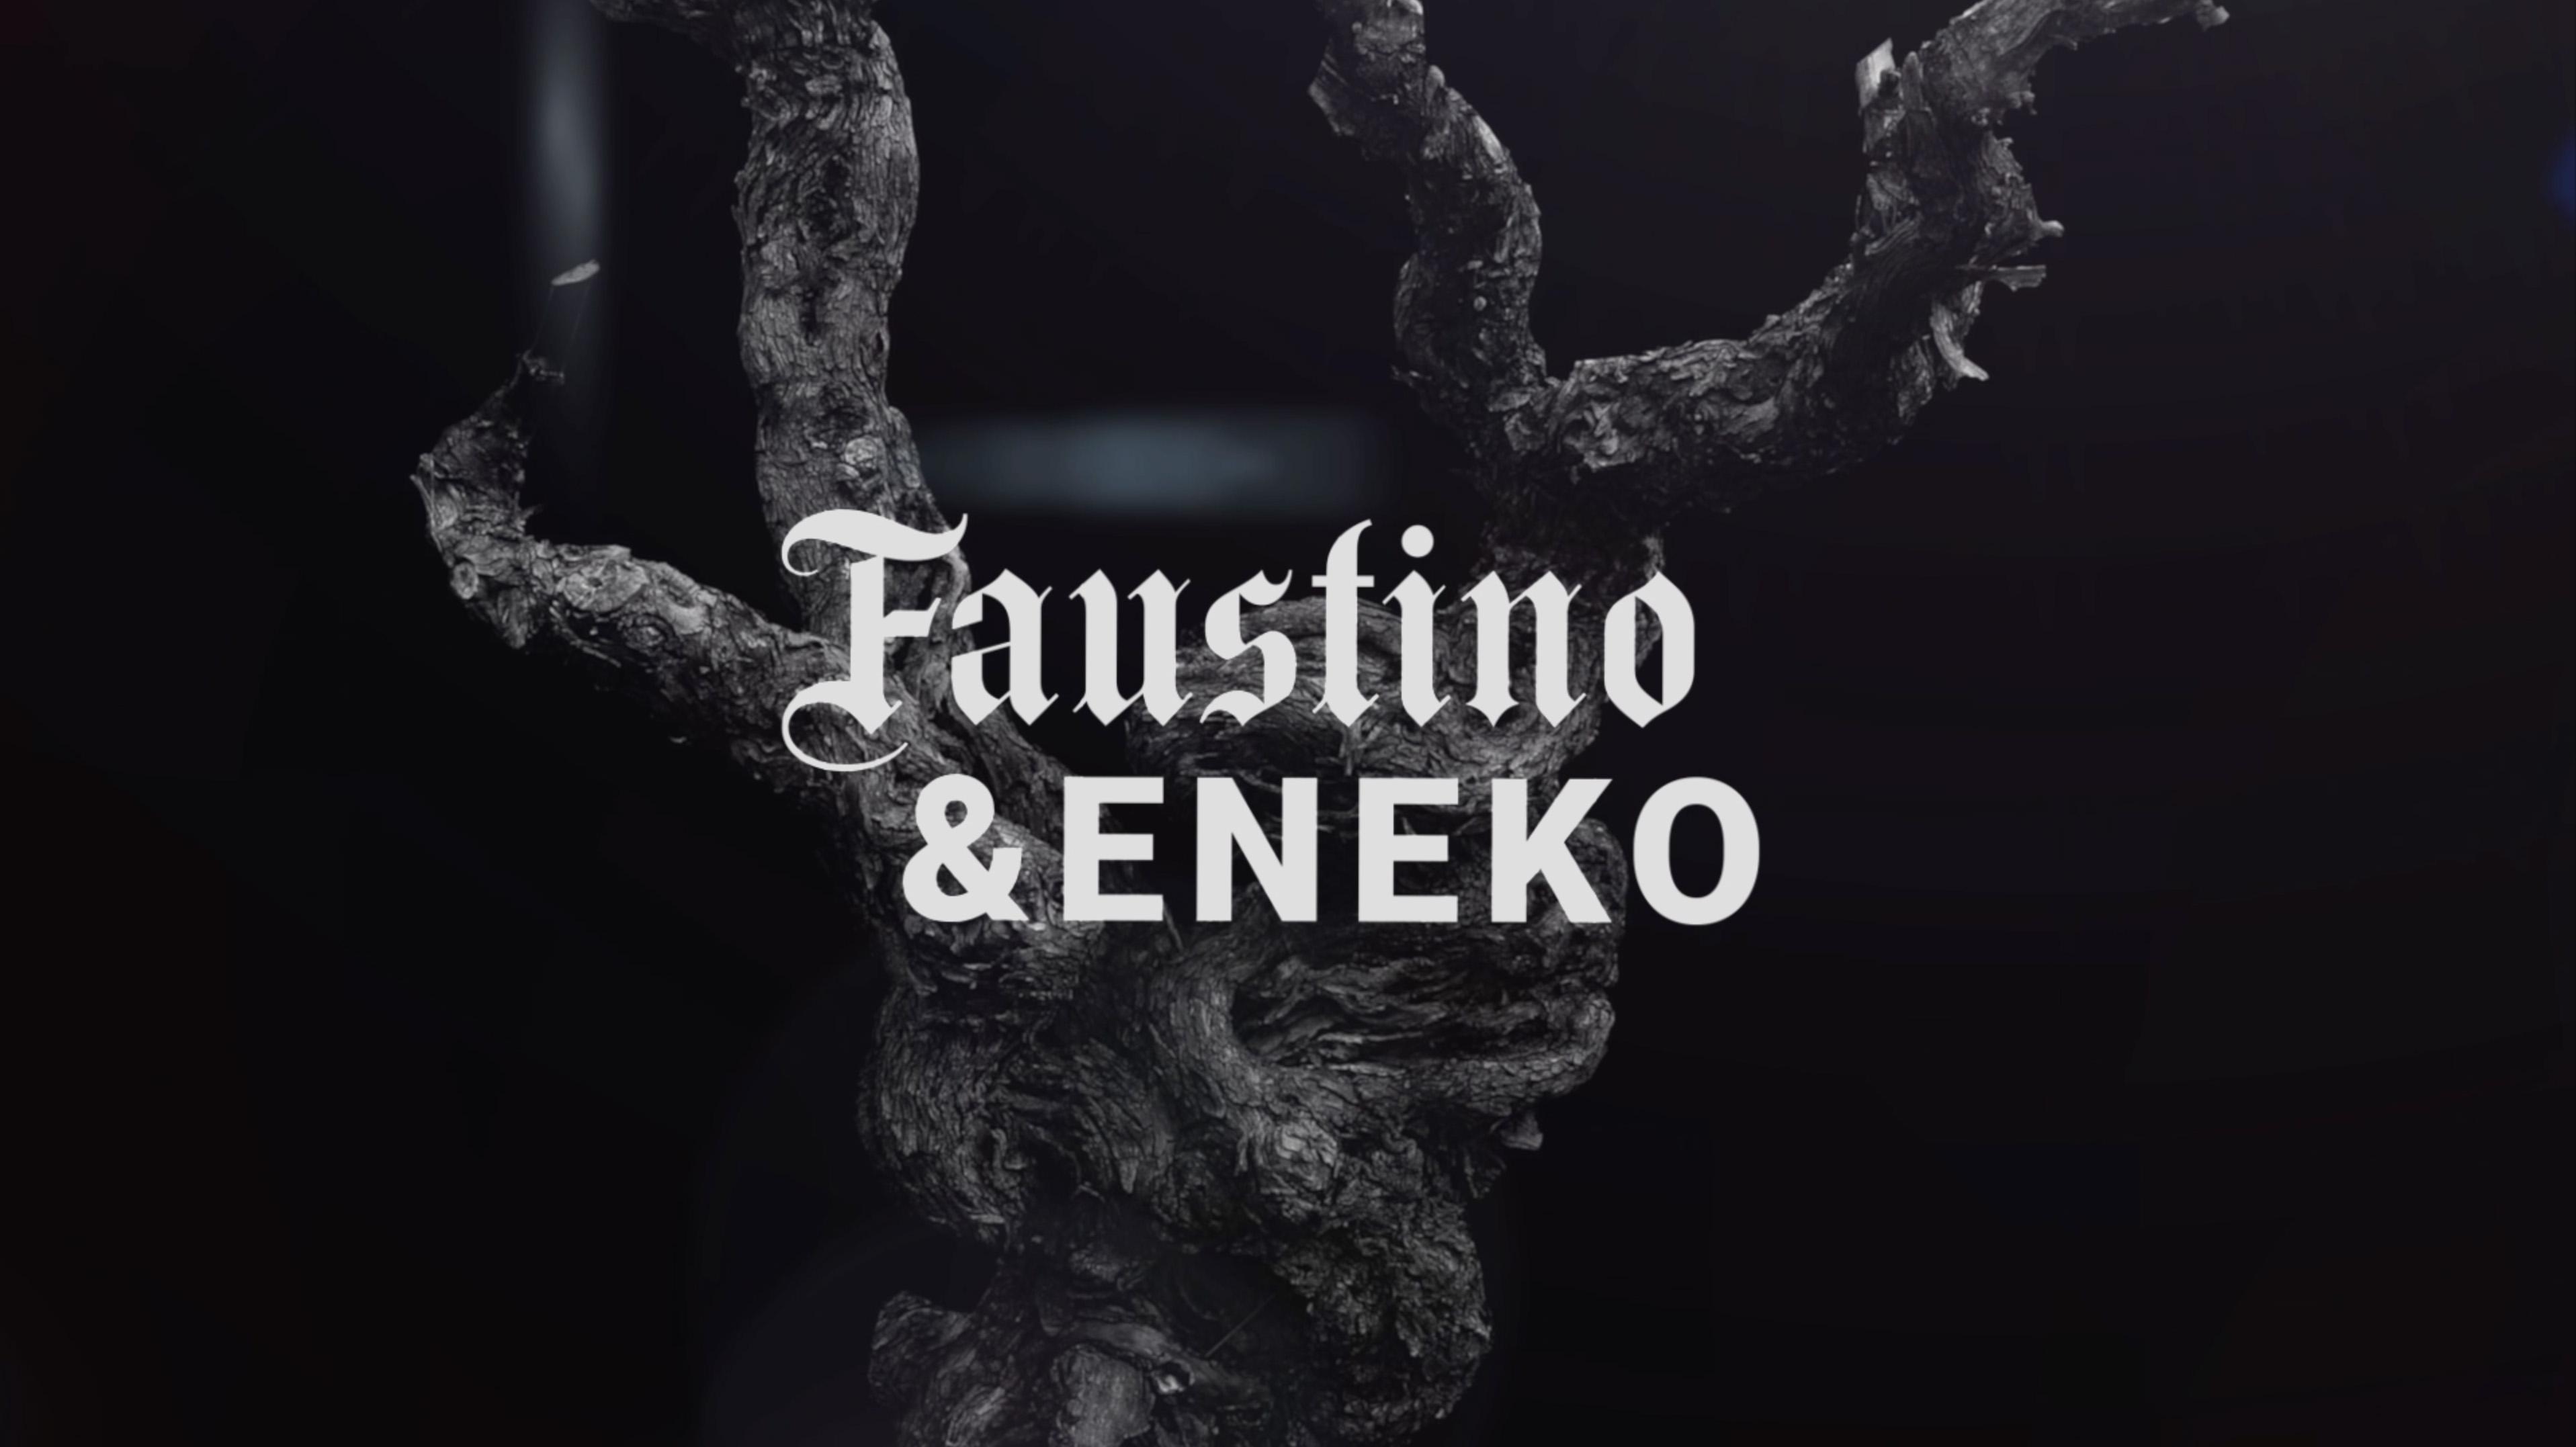 Faustino&Eneko